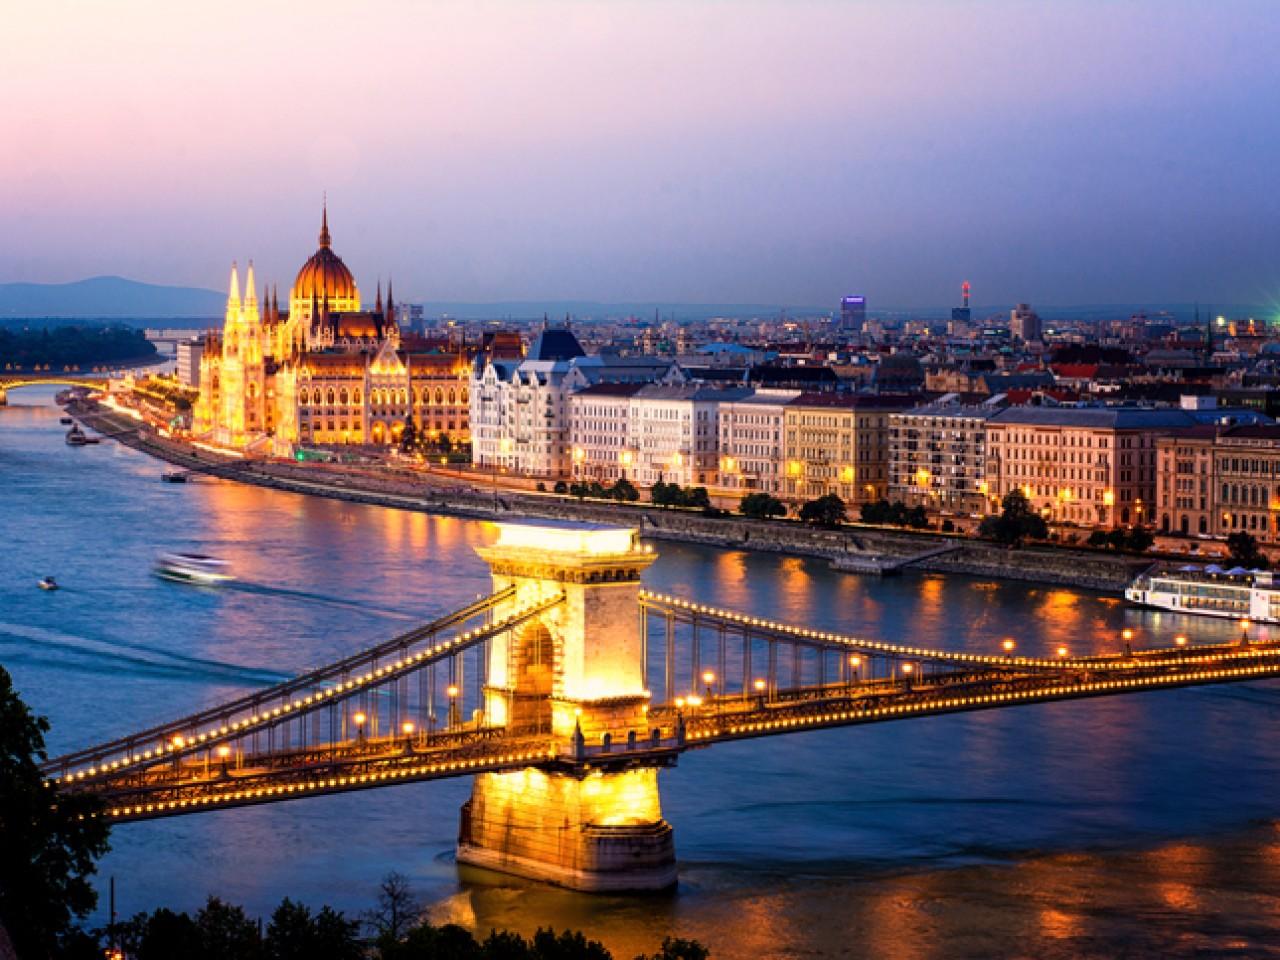 Andrea Bocelli Concert Break Budapest: 15 Nov 19